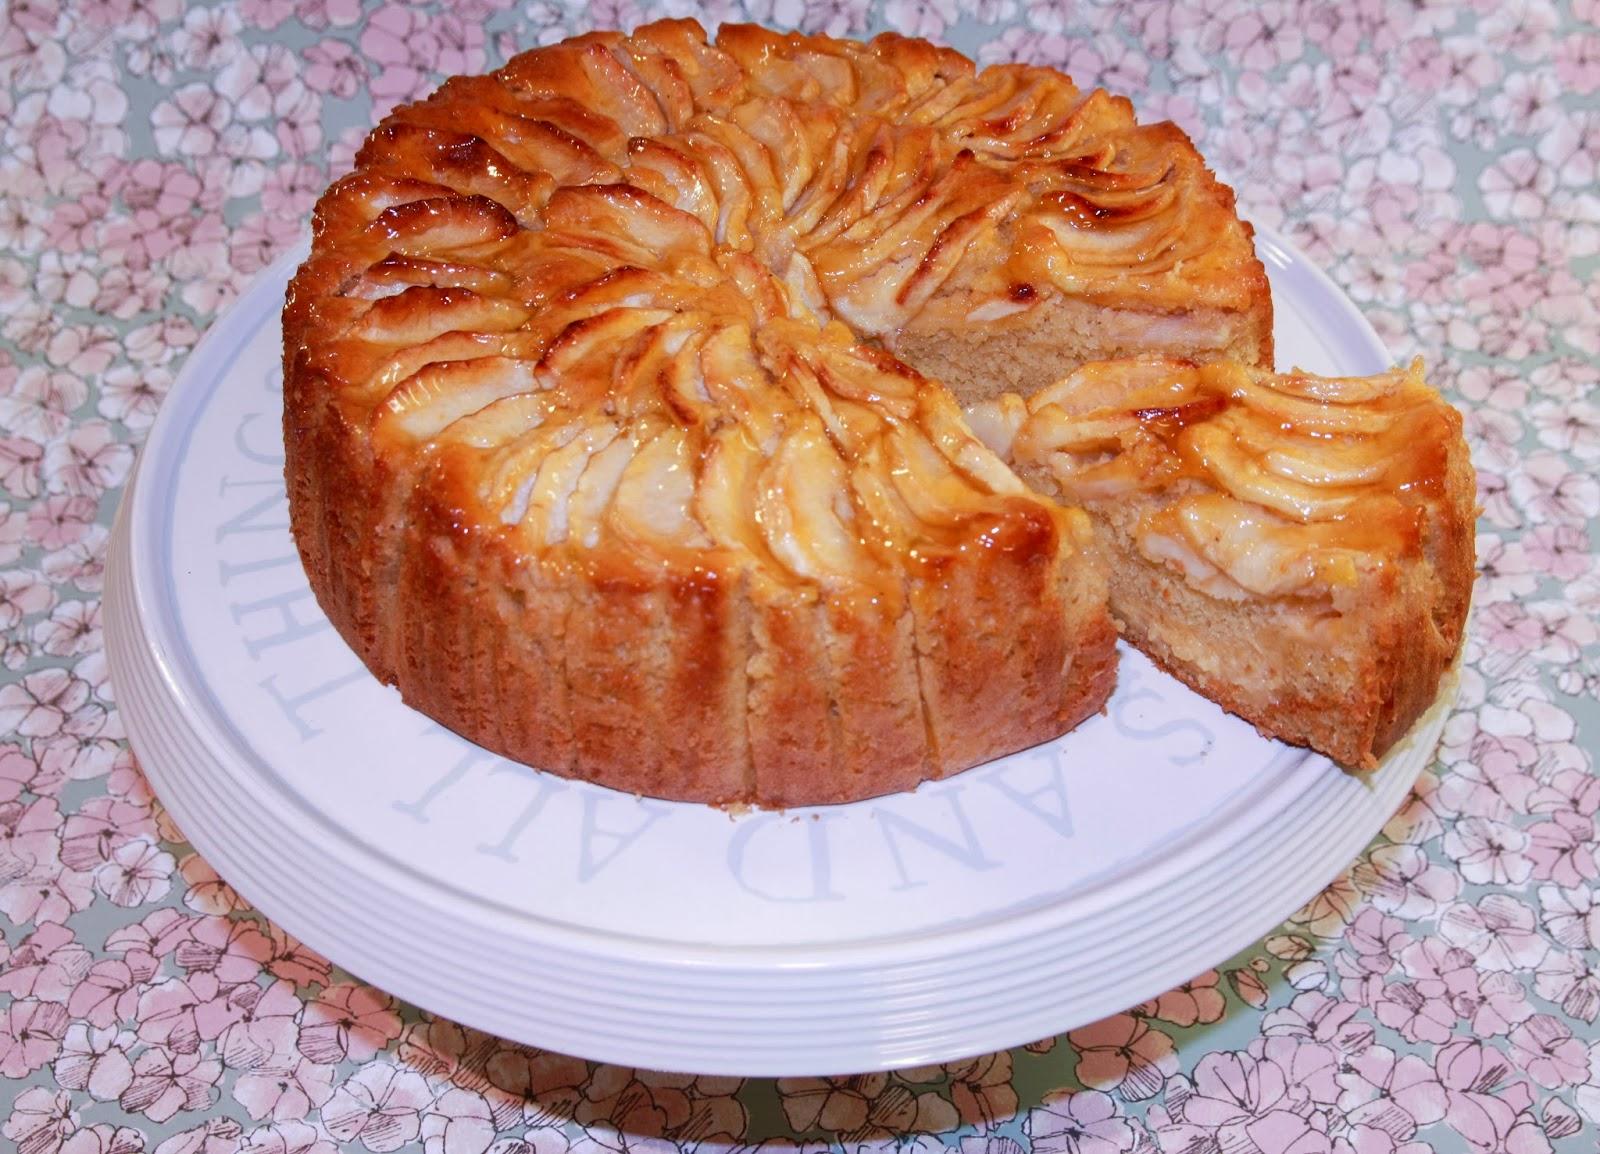 Bramley Apple Cakes